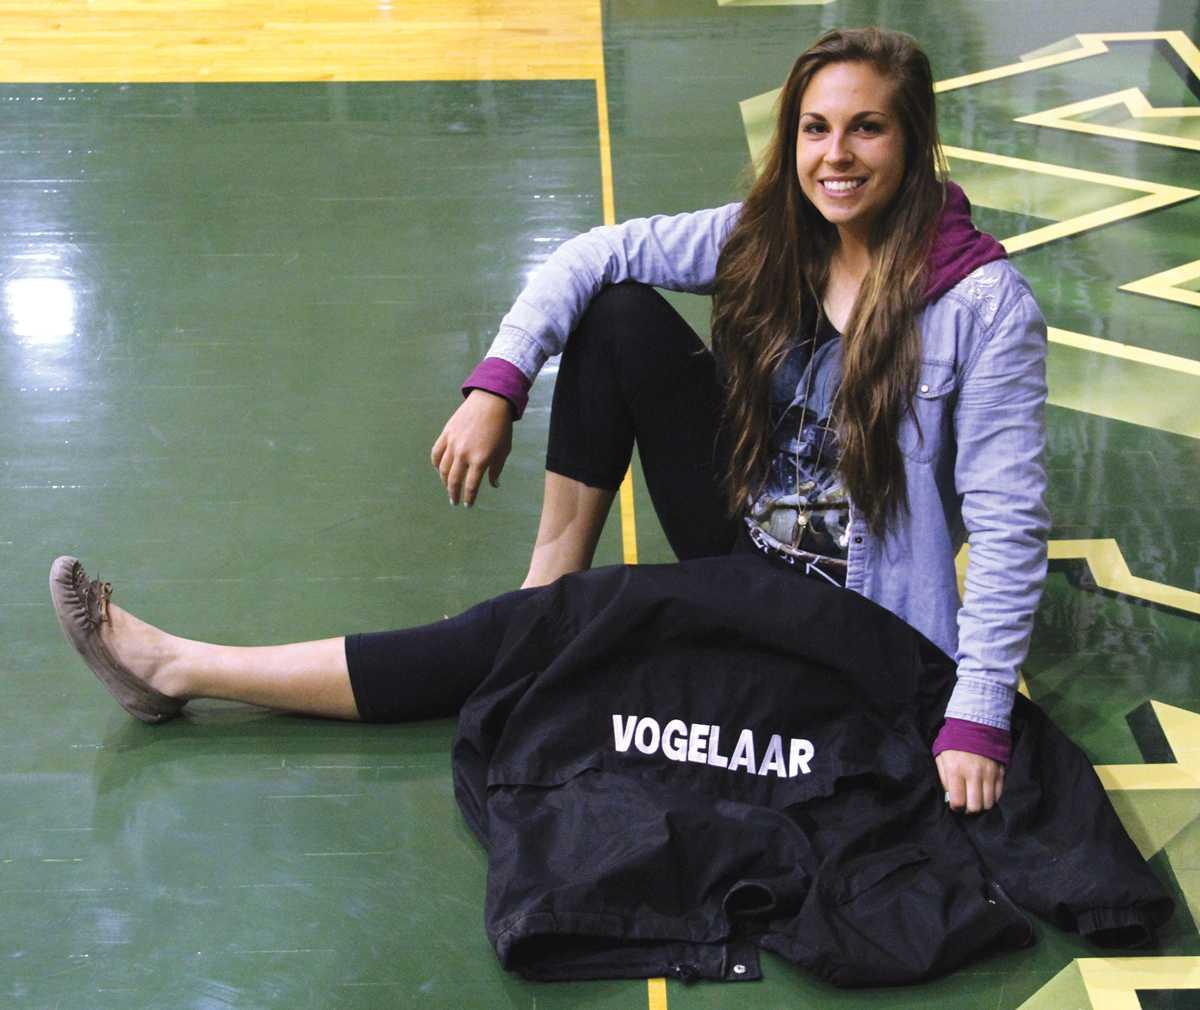 Crusader photo/ Maria Lara Freshman softball player Felisha Vogelaar shows her softball pride as she sits with her softball jacket before  an interview.